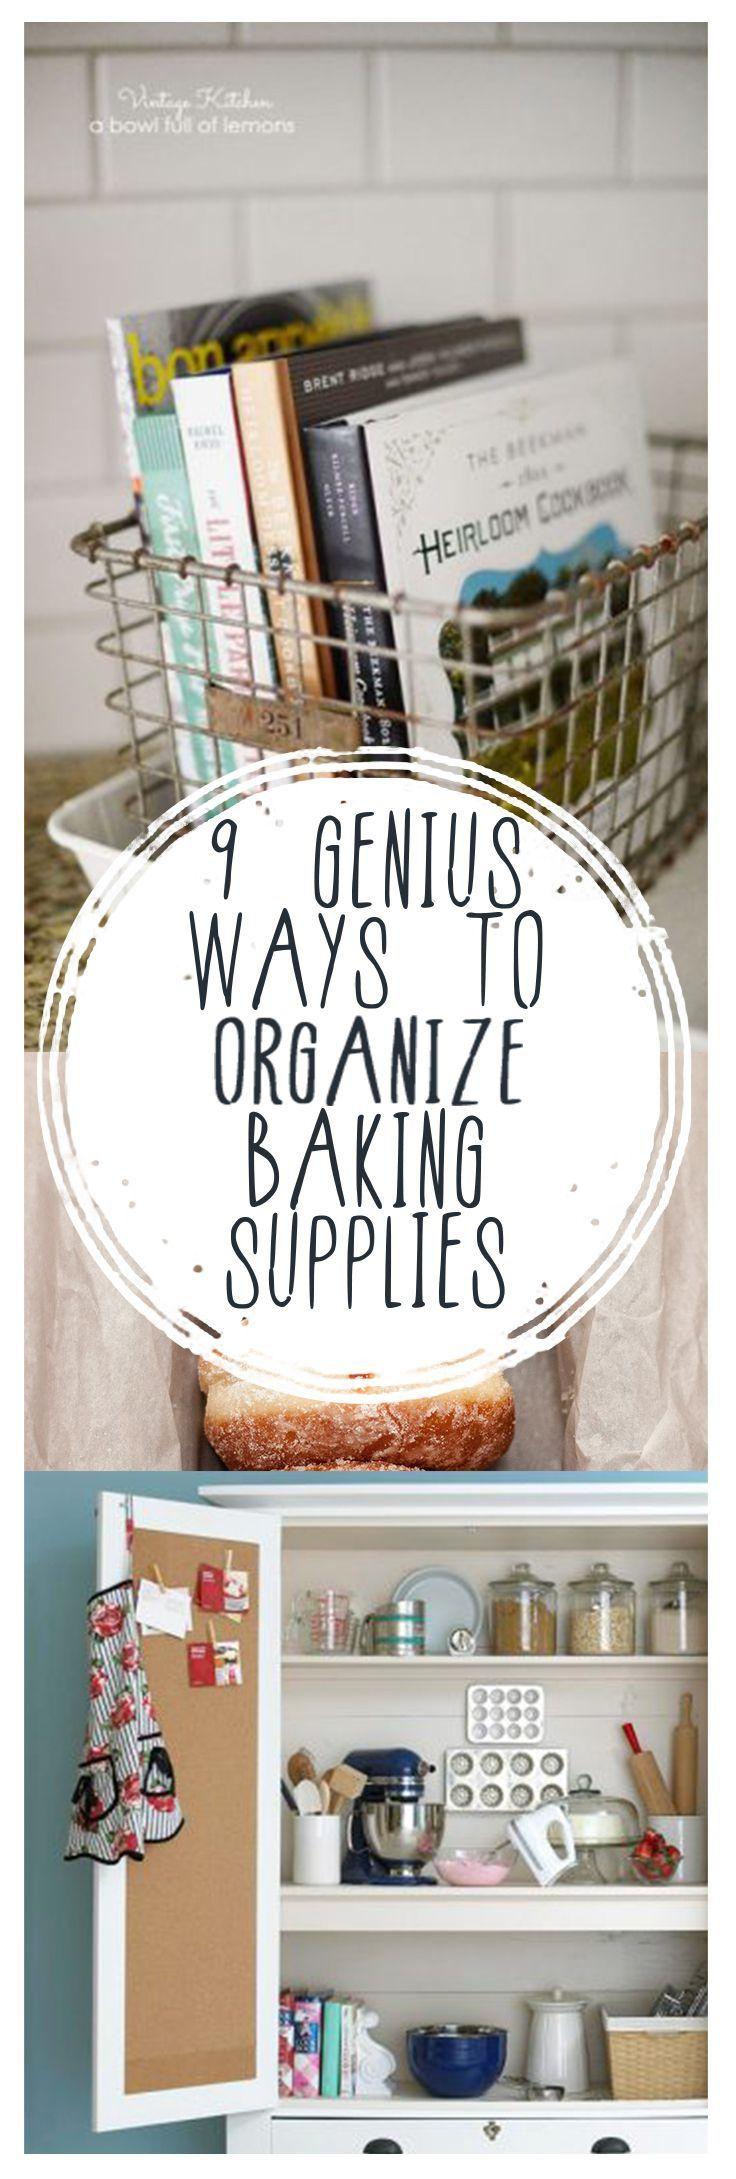 Cupcake Kitchen Decor Sets 25 Best Ideas About Cupcake Kitchen Decor On Pinterest Cupcake